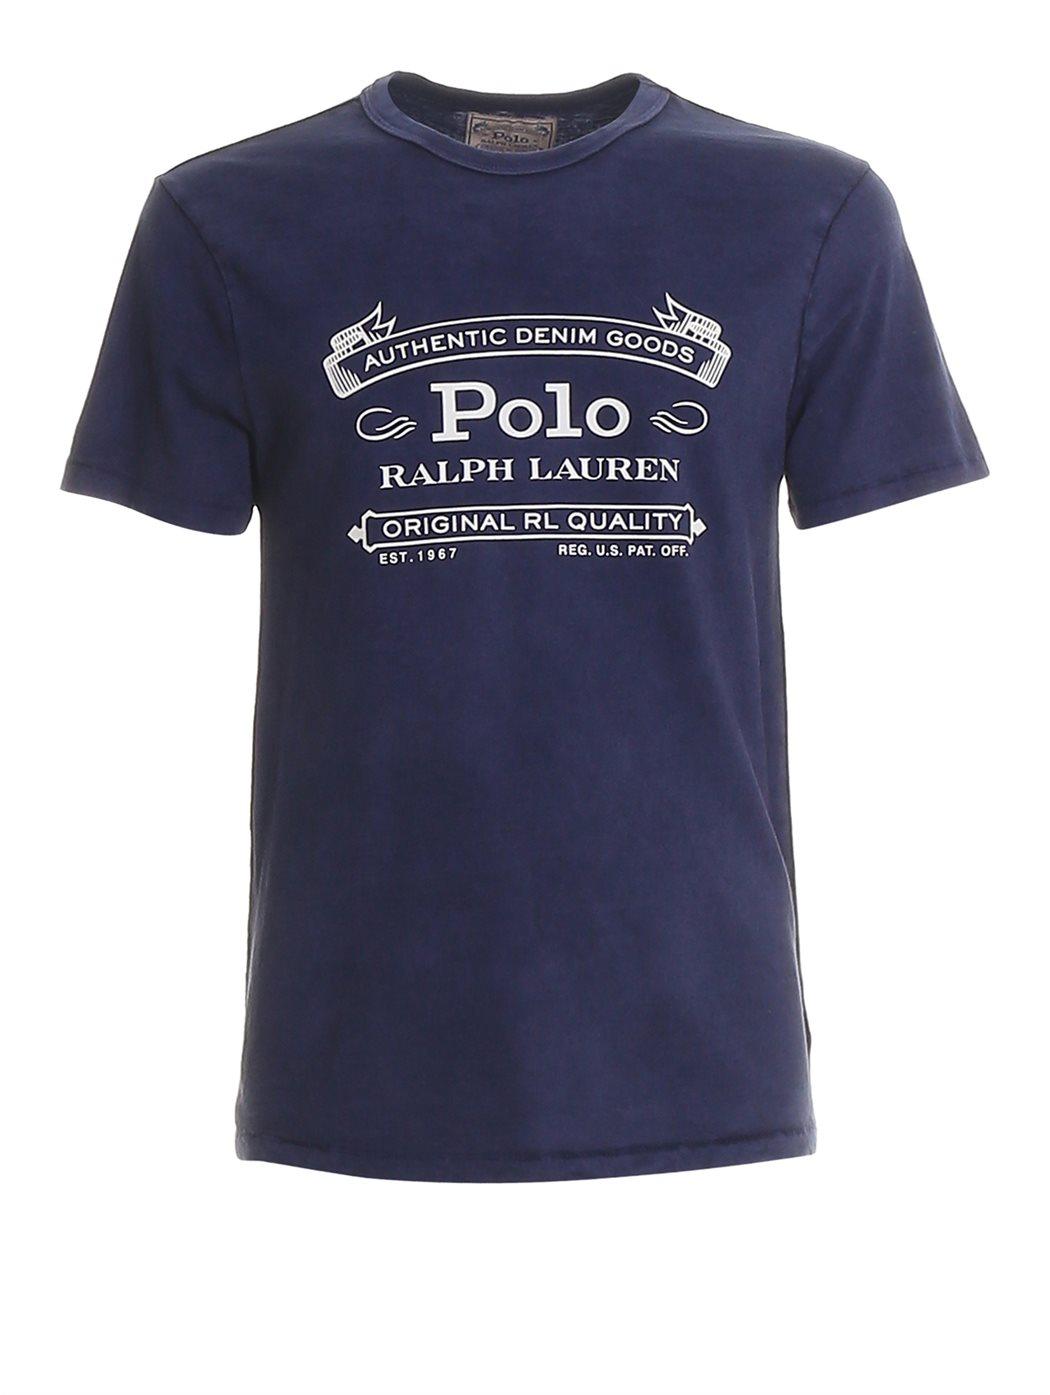 POLO RALPH LAUREN UOMO 71079 002 T-SHIRT